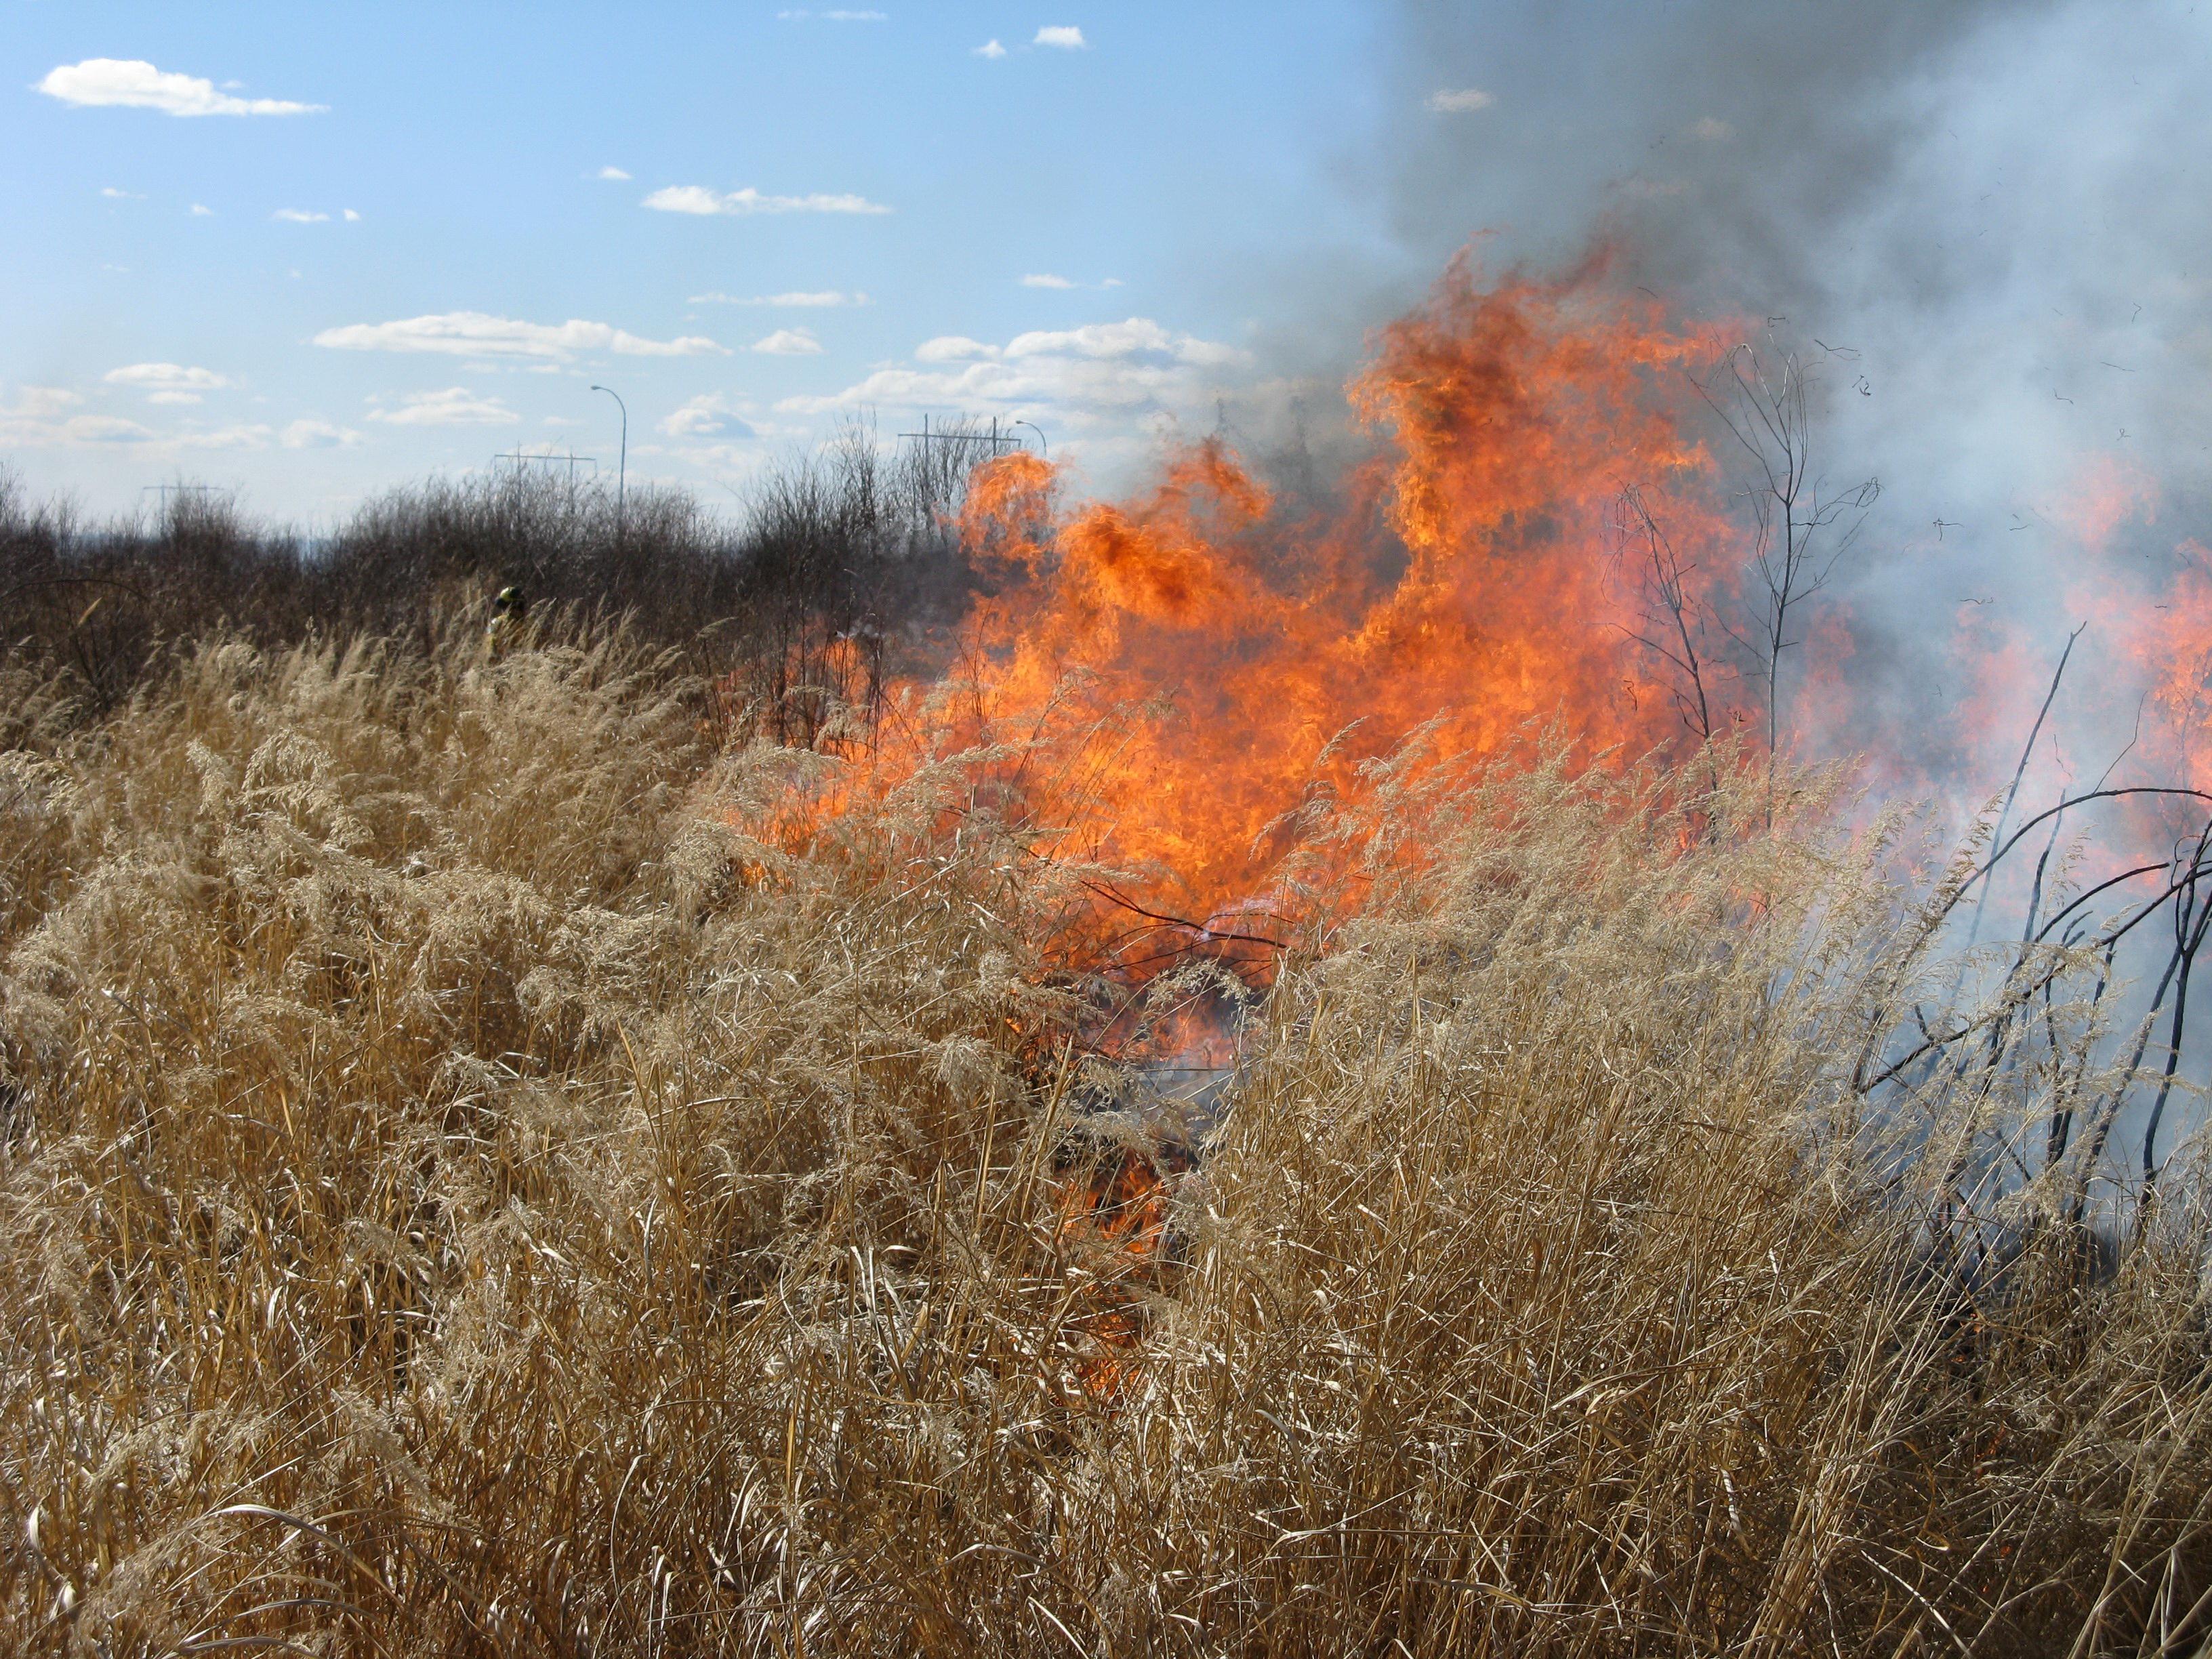 --gwbnasfs01.env.gov.ab.ca-Leah.Lovequist-2011-ads-Grass_burning